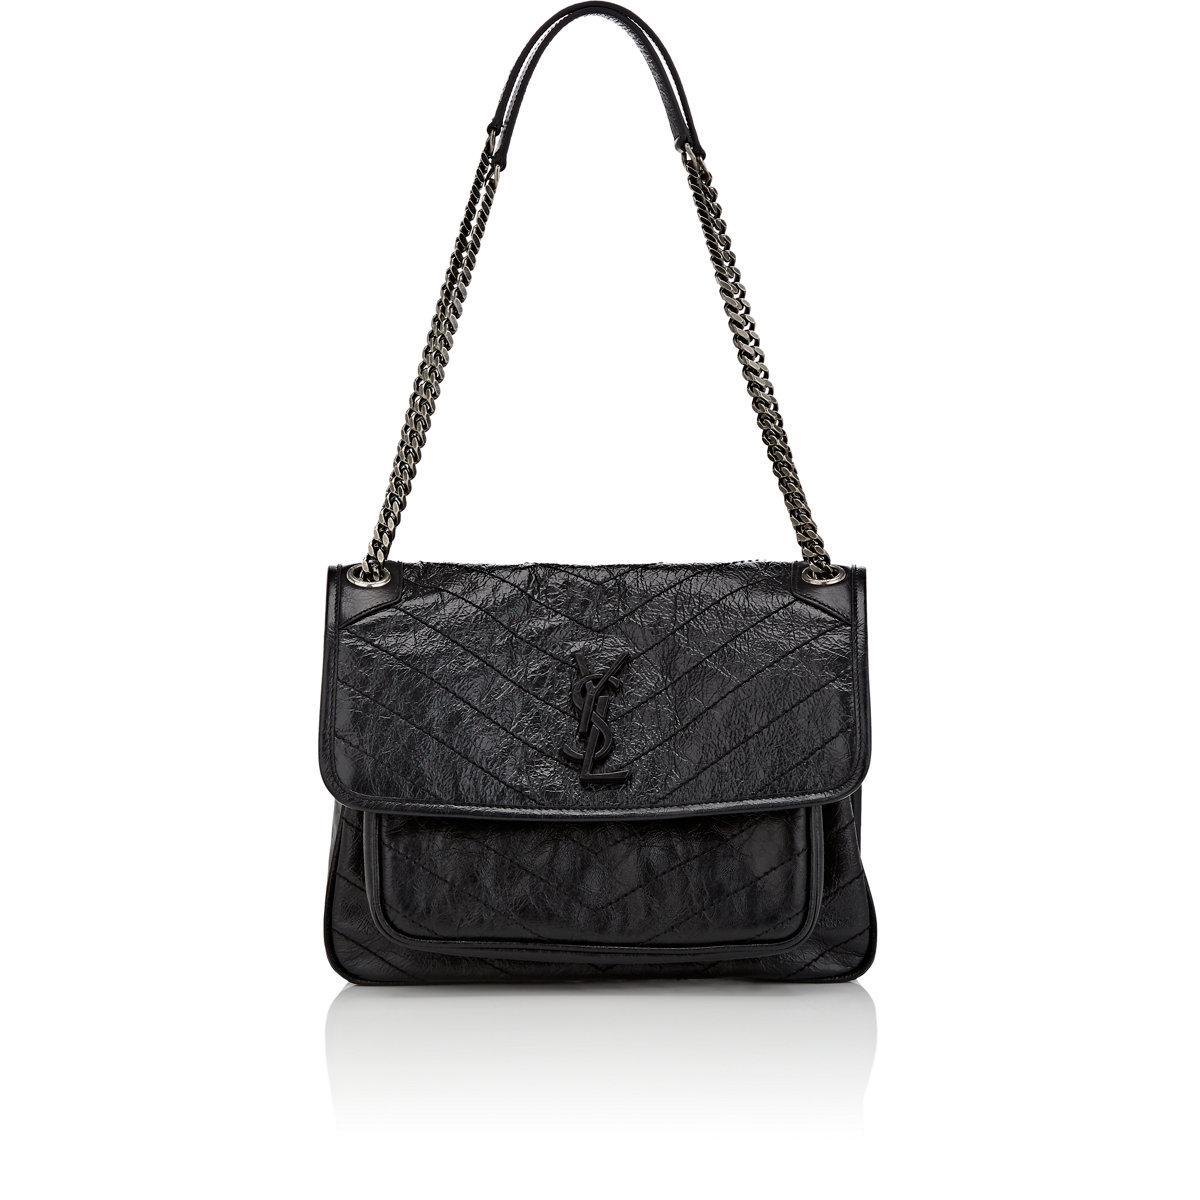 e09f5ff48fbd Saint Laurent Nolita Medium Chain Bag In Vintage Leather. Saint laurent  Monogram Niki Medium Leather Shoulder Bag in Black